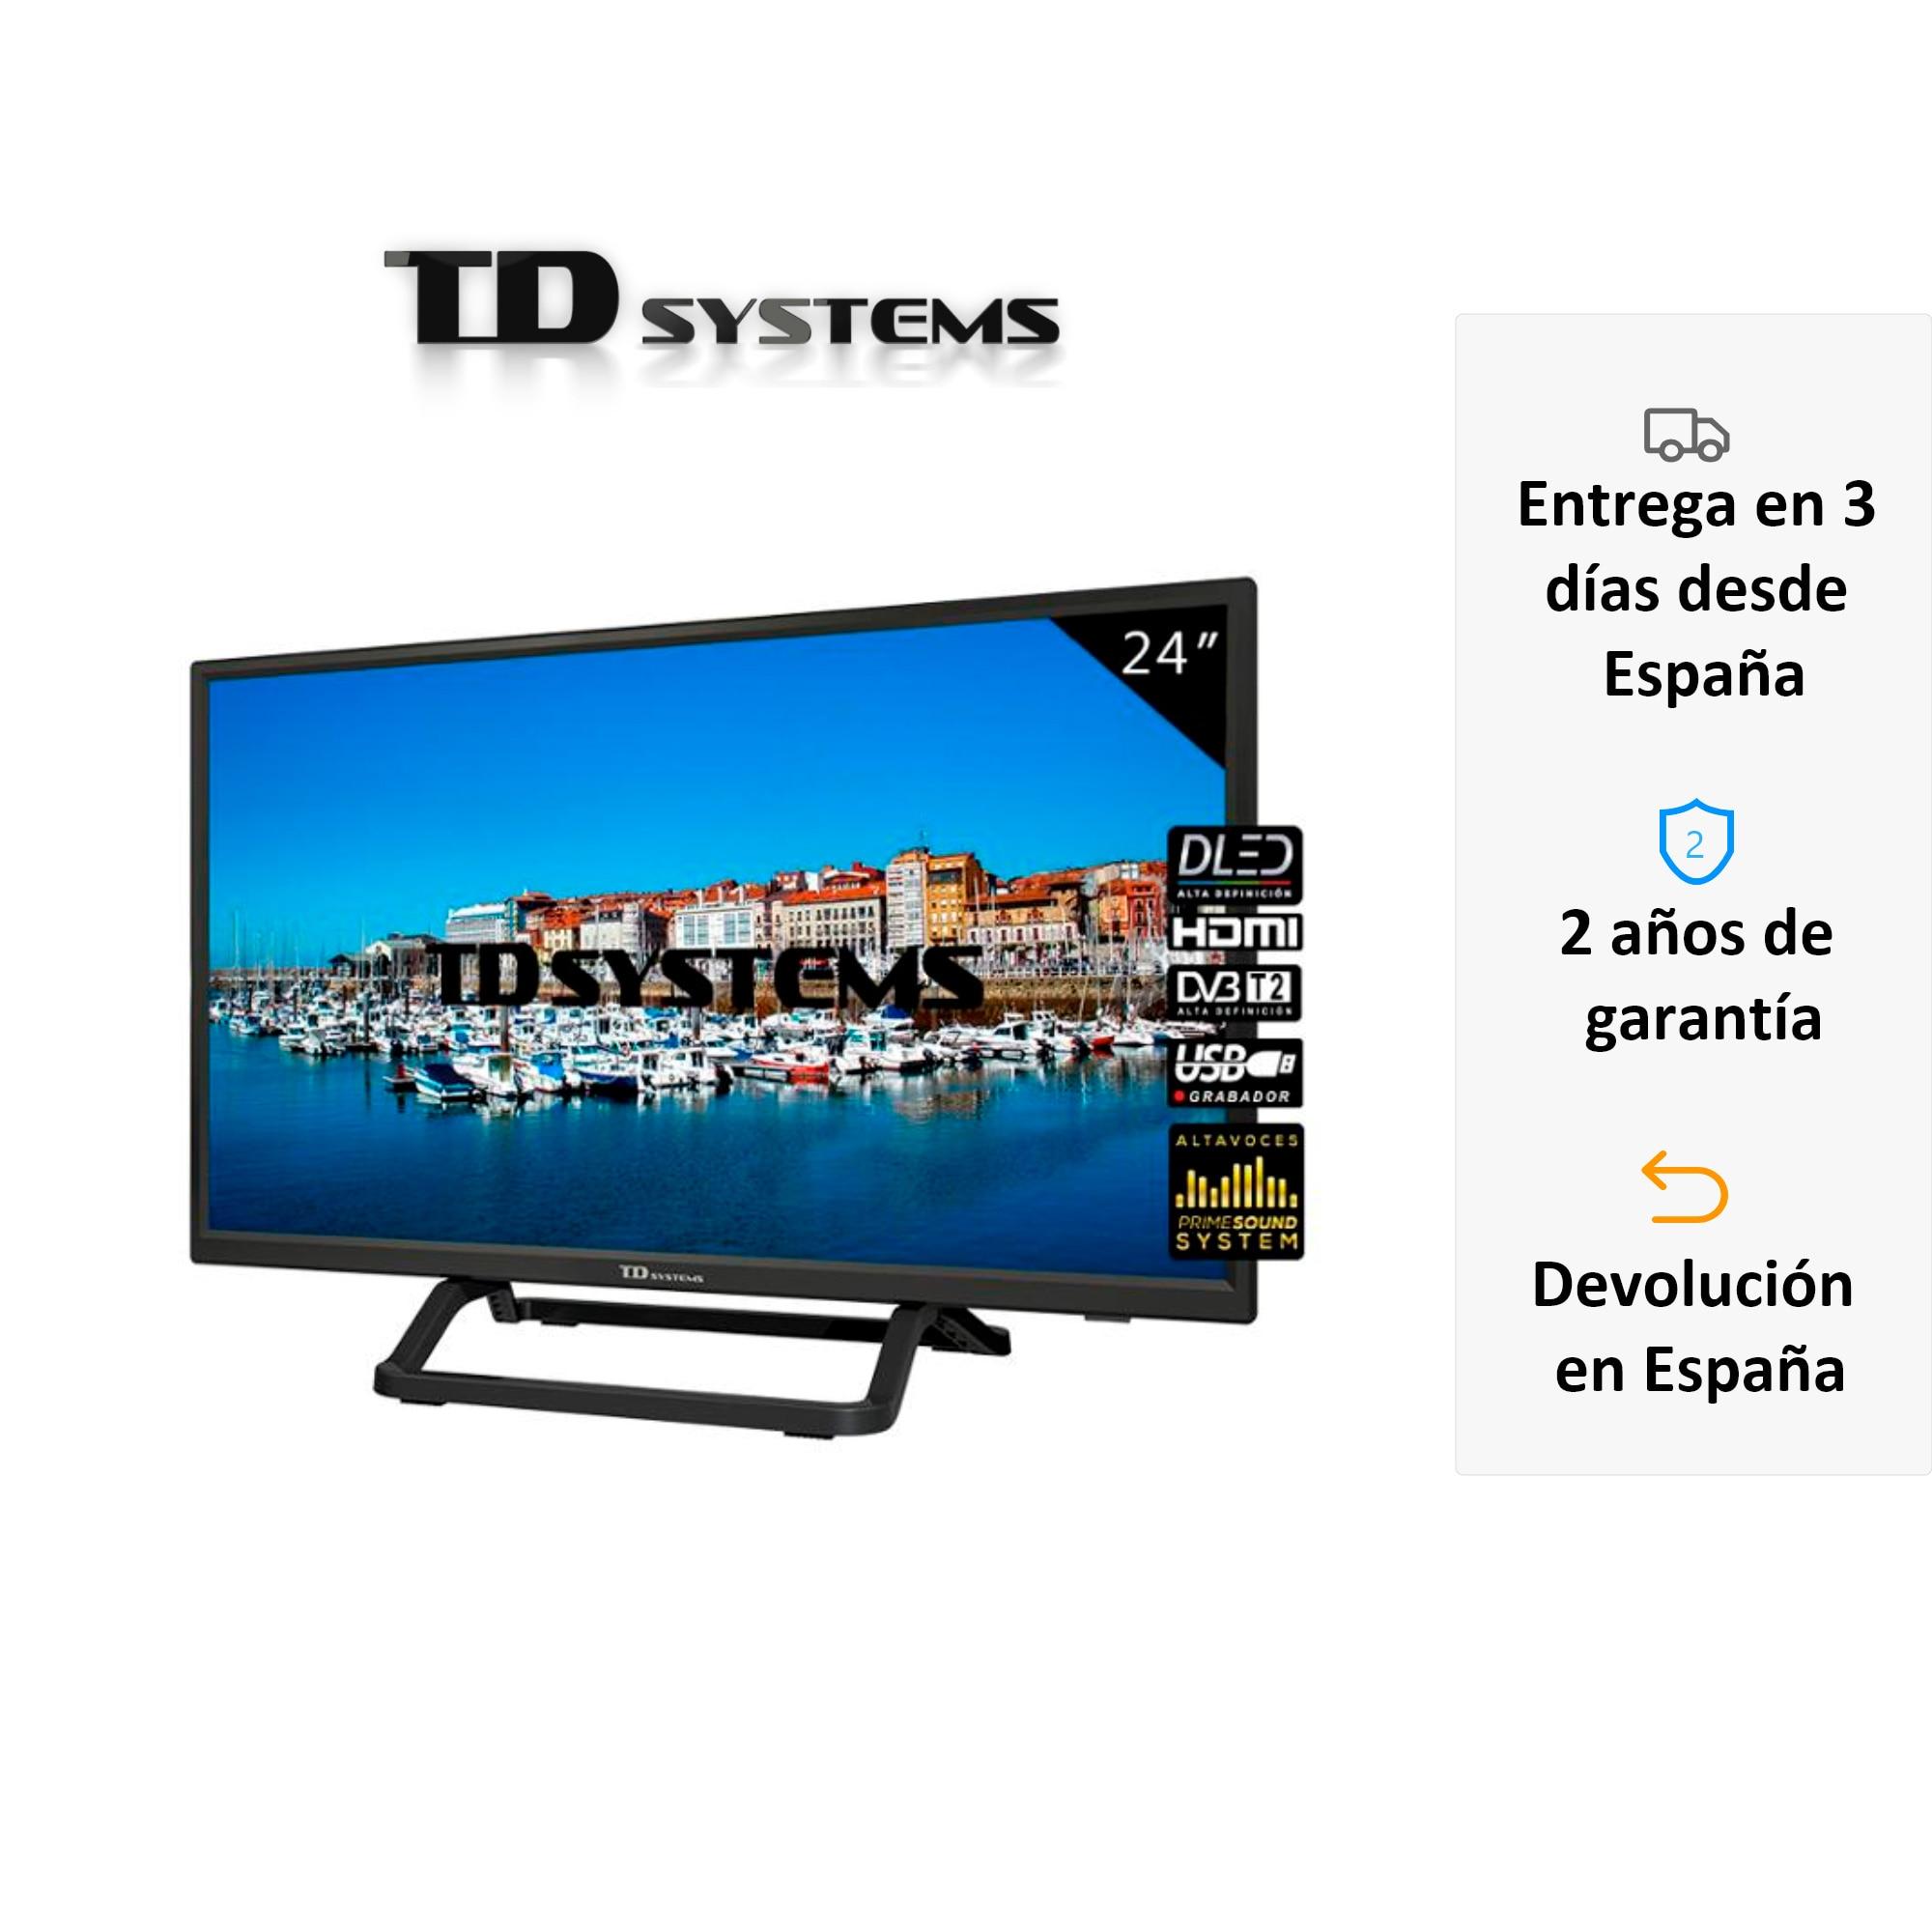 Televisores 24 Pulgadas TD Systems K24DLX10H. HDMI, VGA, USB Grabador, DVB-T2/C/S2 [Envío desde España, garantía de 2 años]